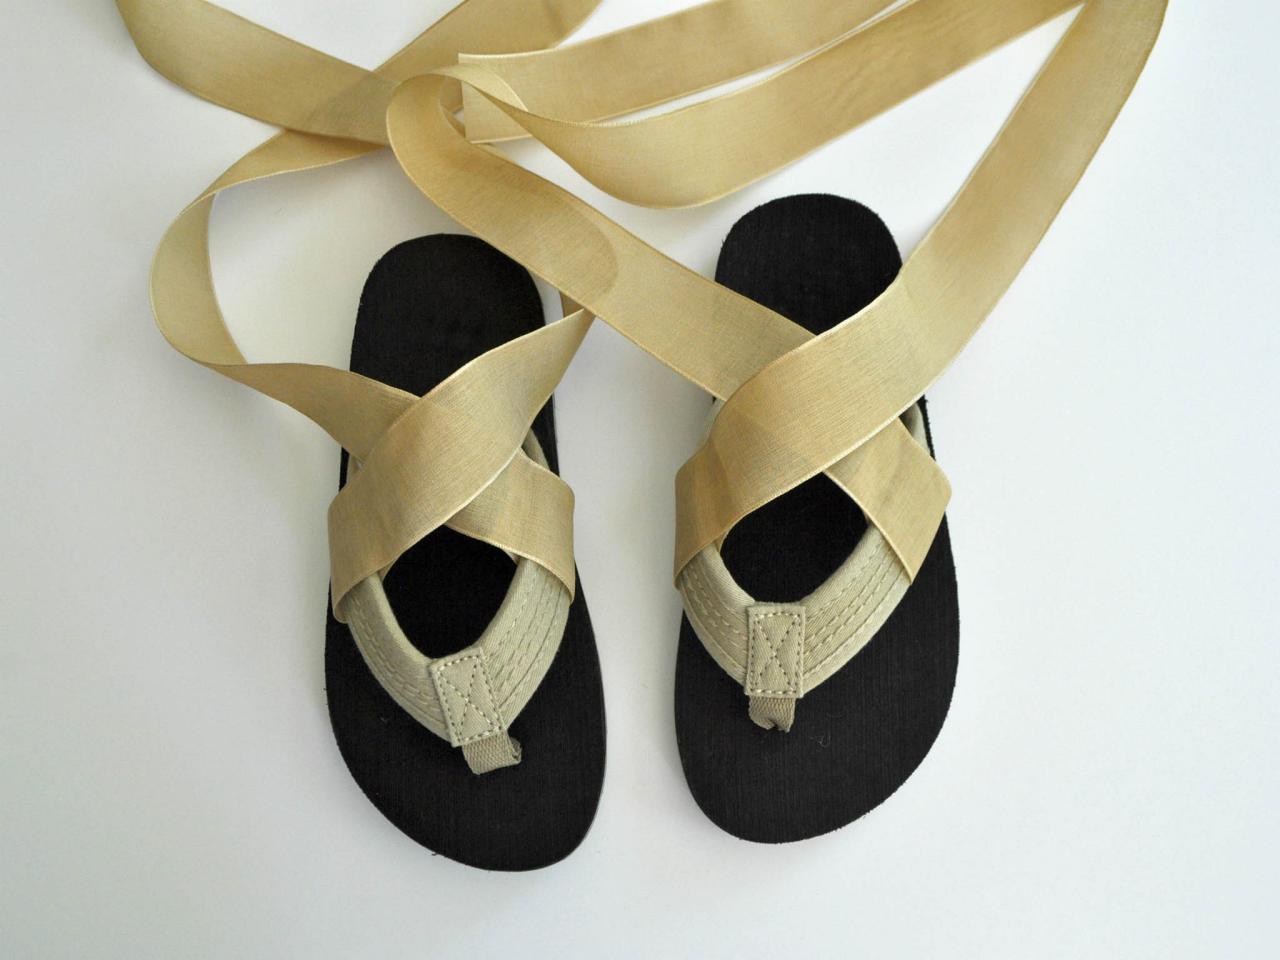 Easy no sew toga halloween costume hgtv roman toga costume step 2 make roman sandals solutioingenieria Gallery